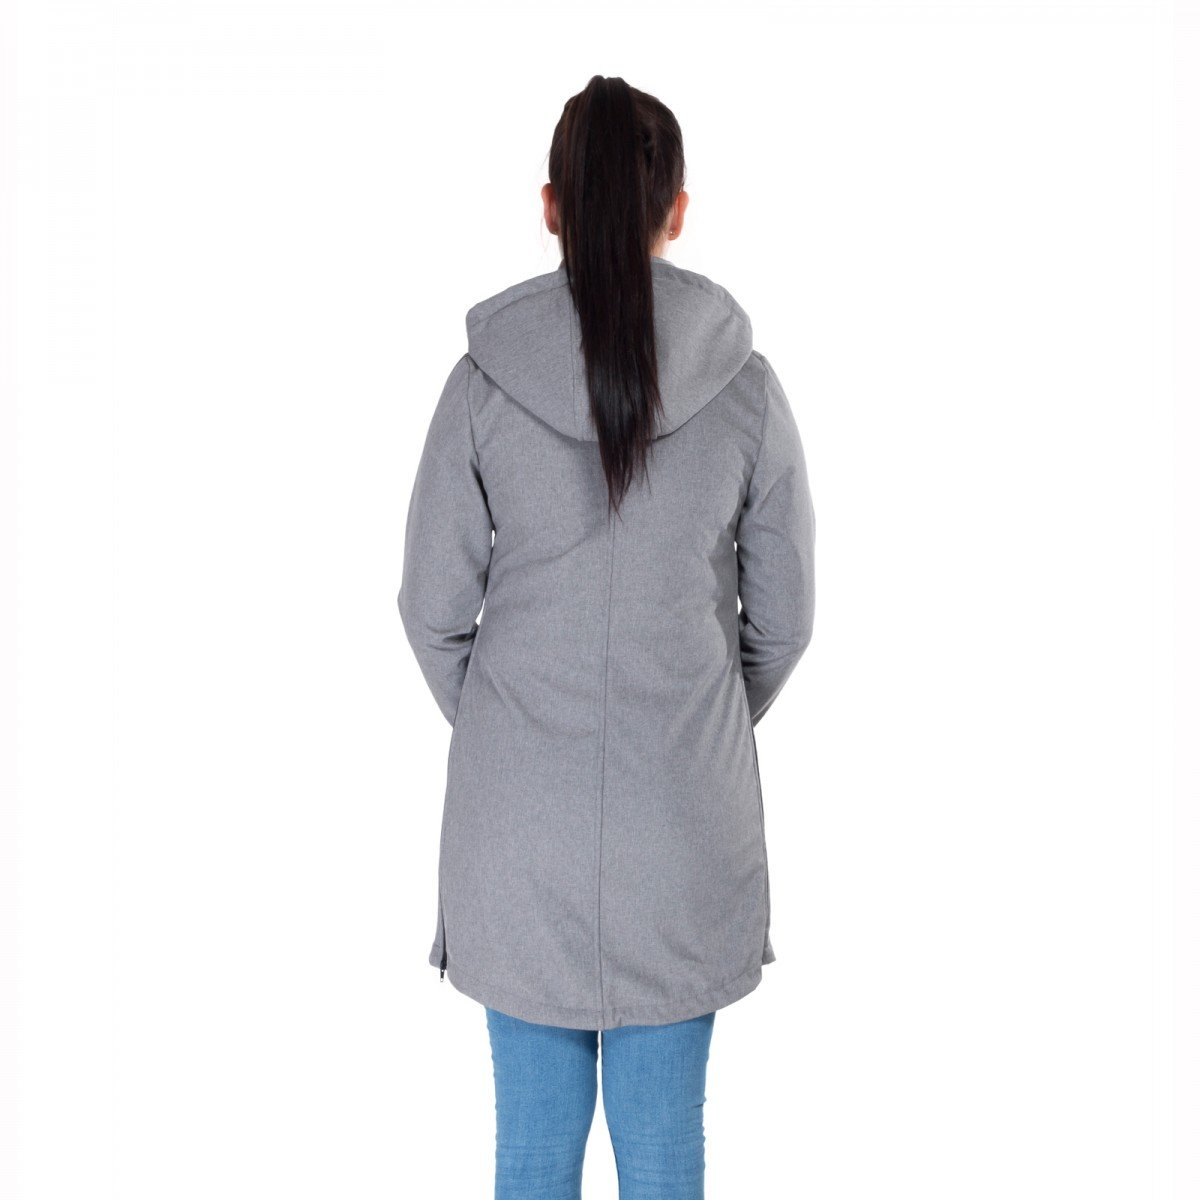 Amazon.com: fun2bemum 3 in1 Softshell – Chaqueta Coat ...